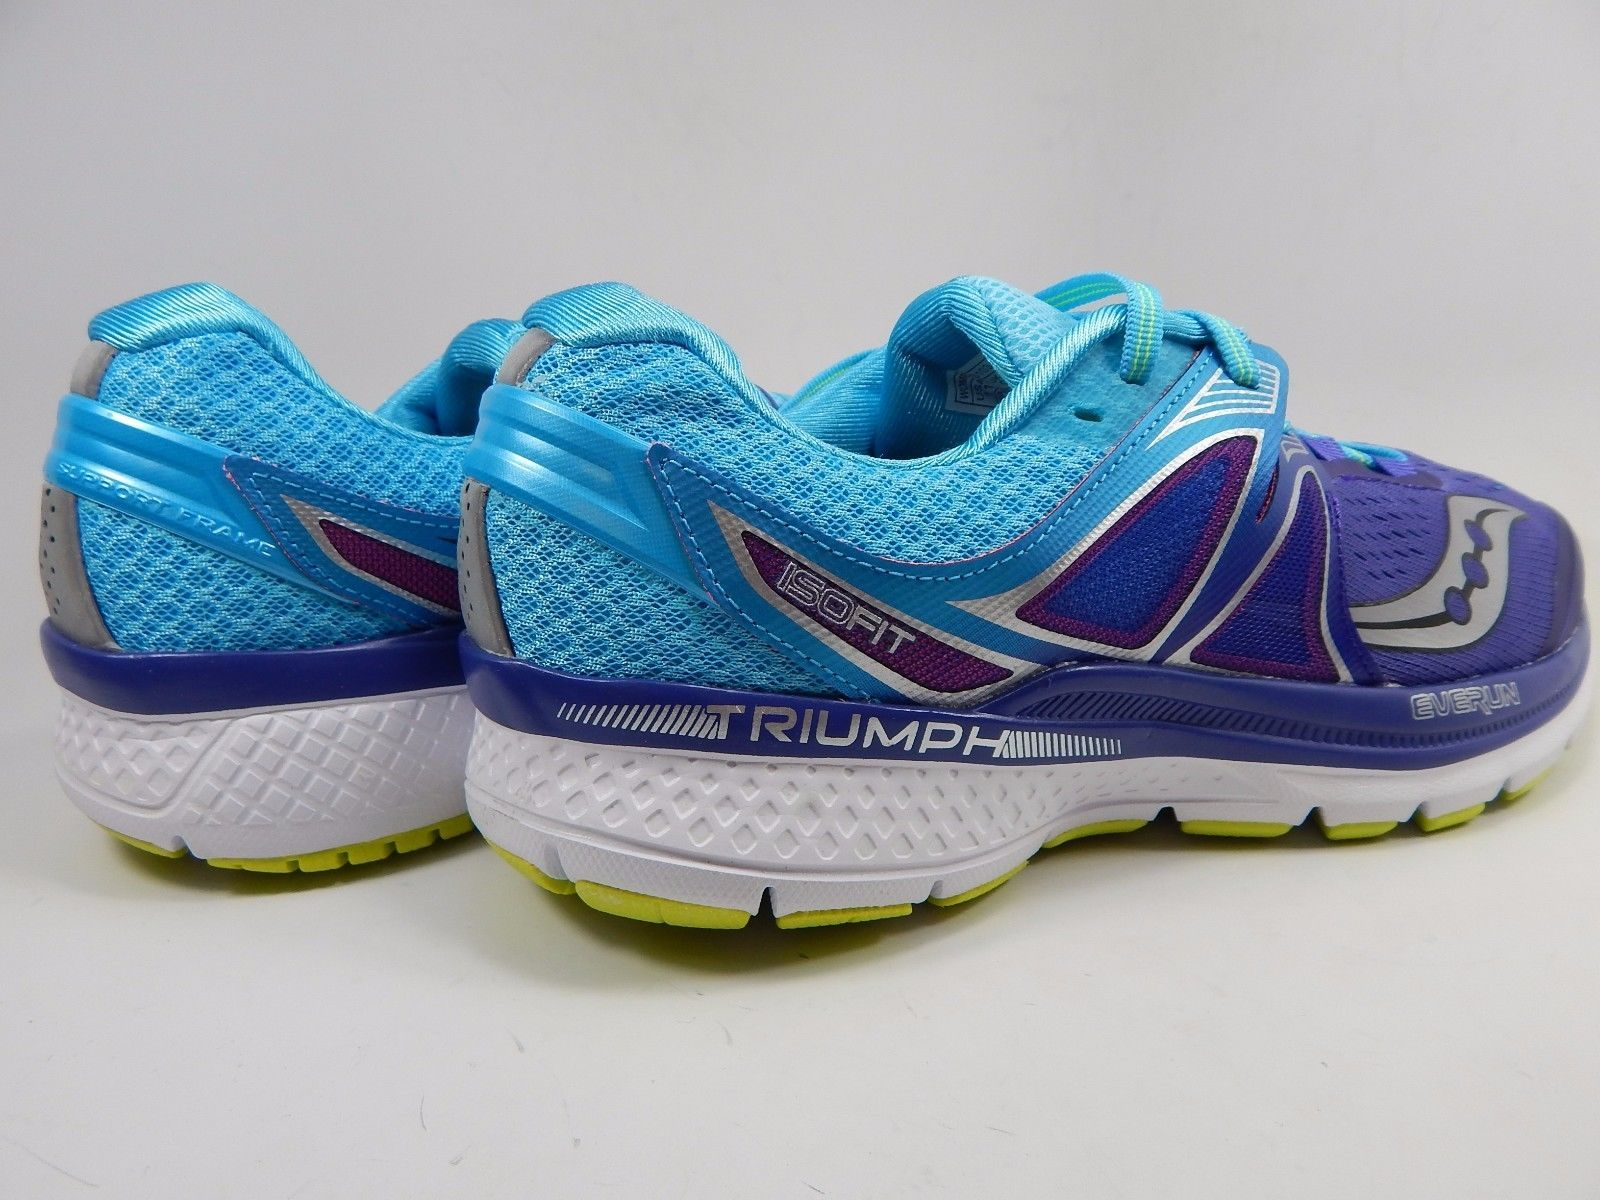 Saucony Triumph ISO 3 Women's Running Shoes Sz: US 11 M (B) EU 43 Blue S10346-1